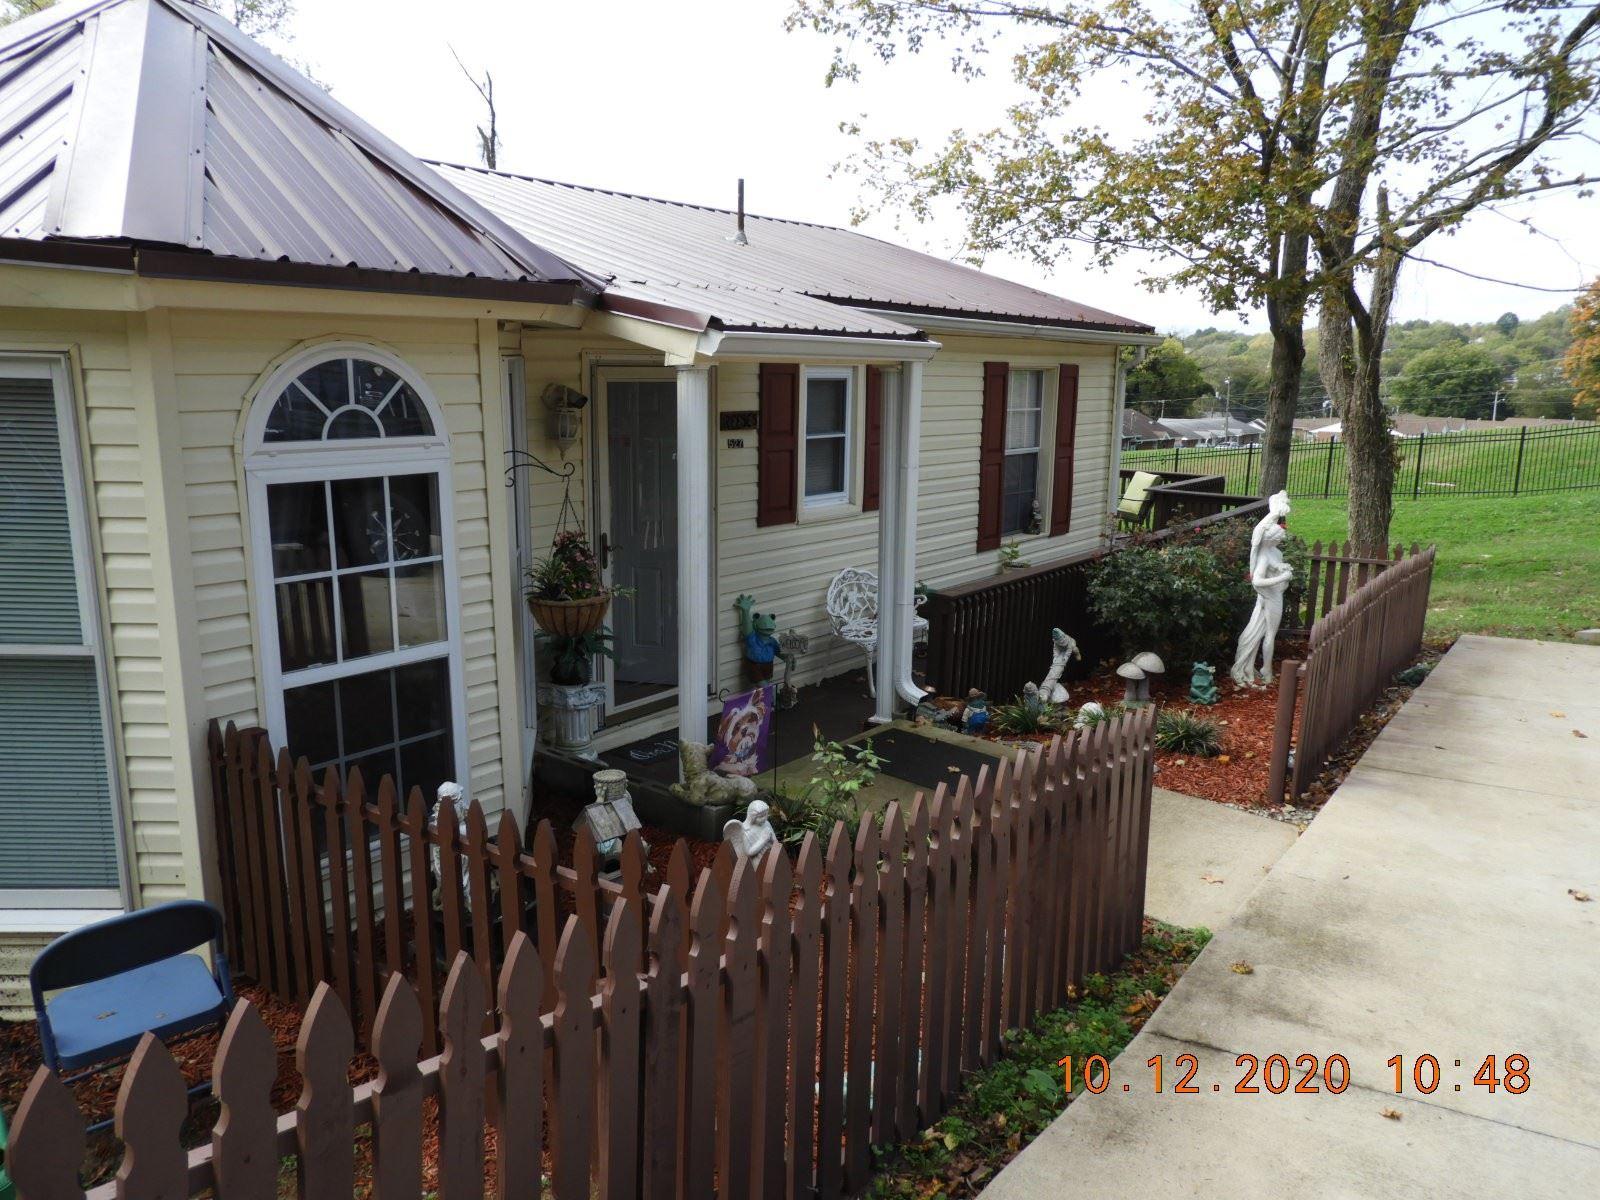 527 E Grigsby St, Pulaski, TN 38478 - MLS#: 2197636